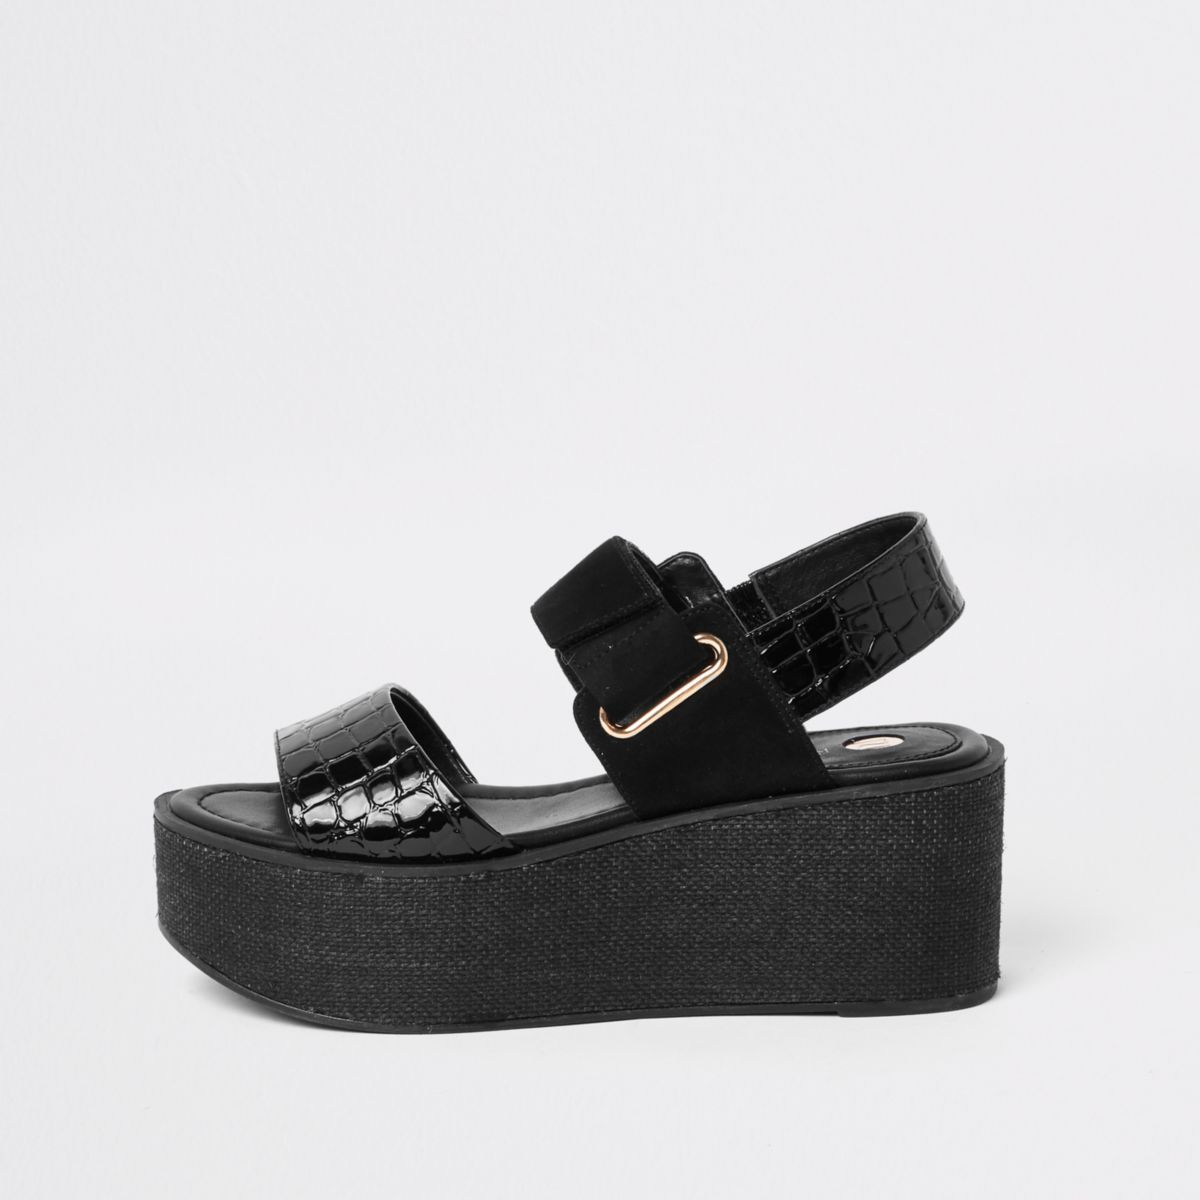 Black wedge heel platform sandals